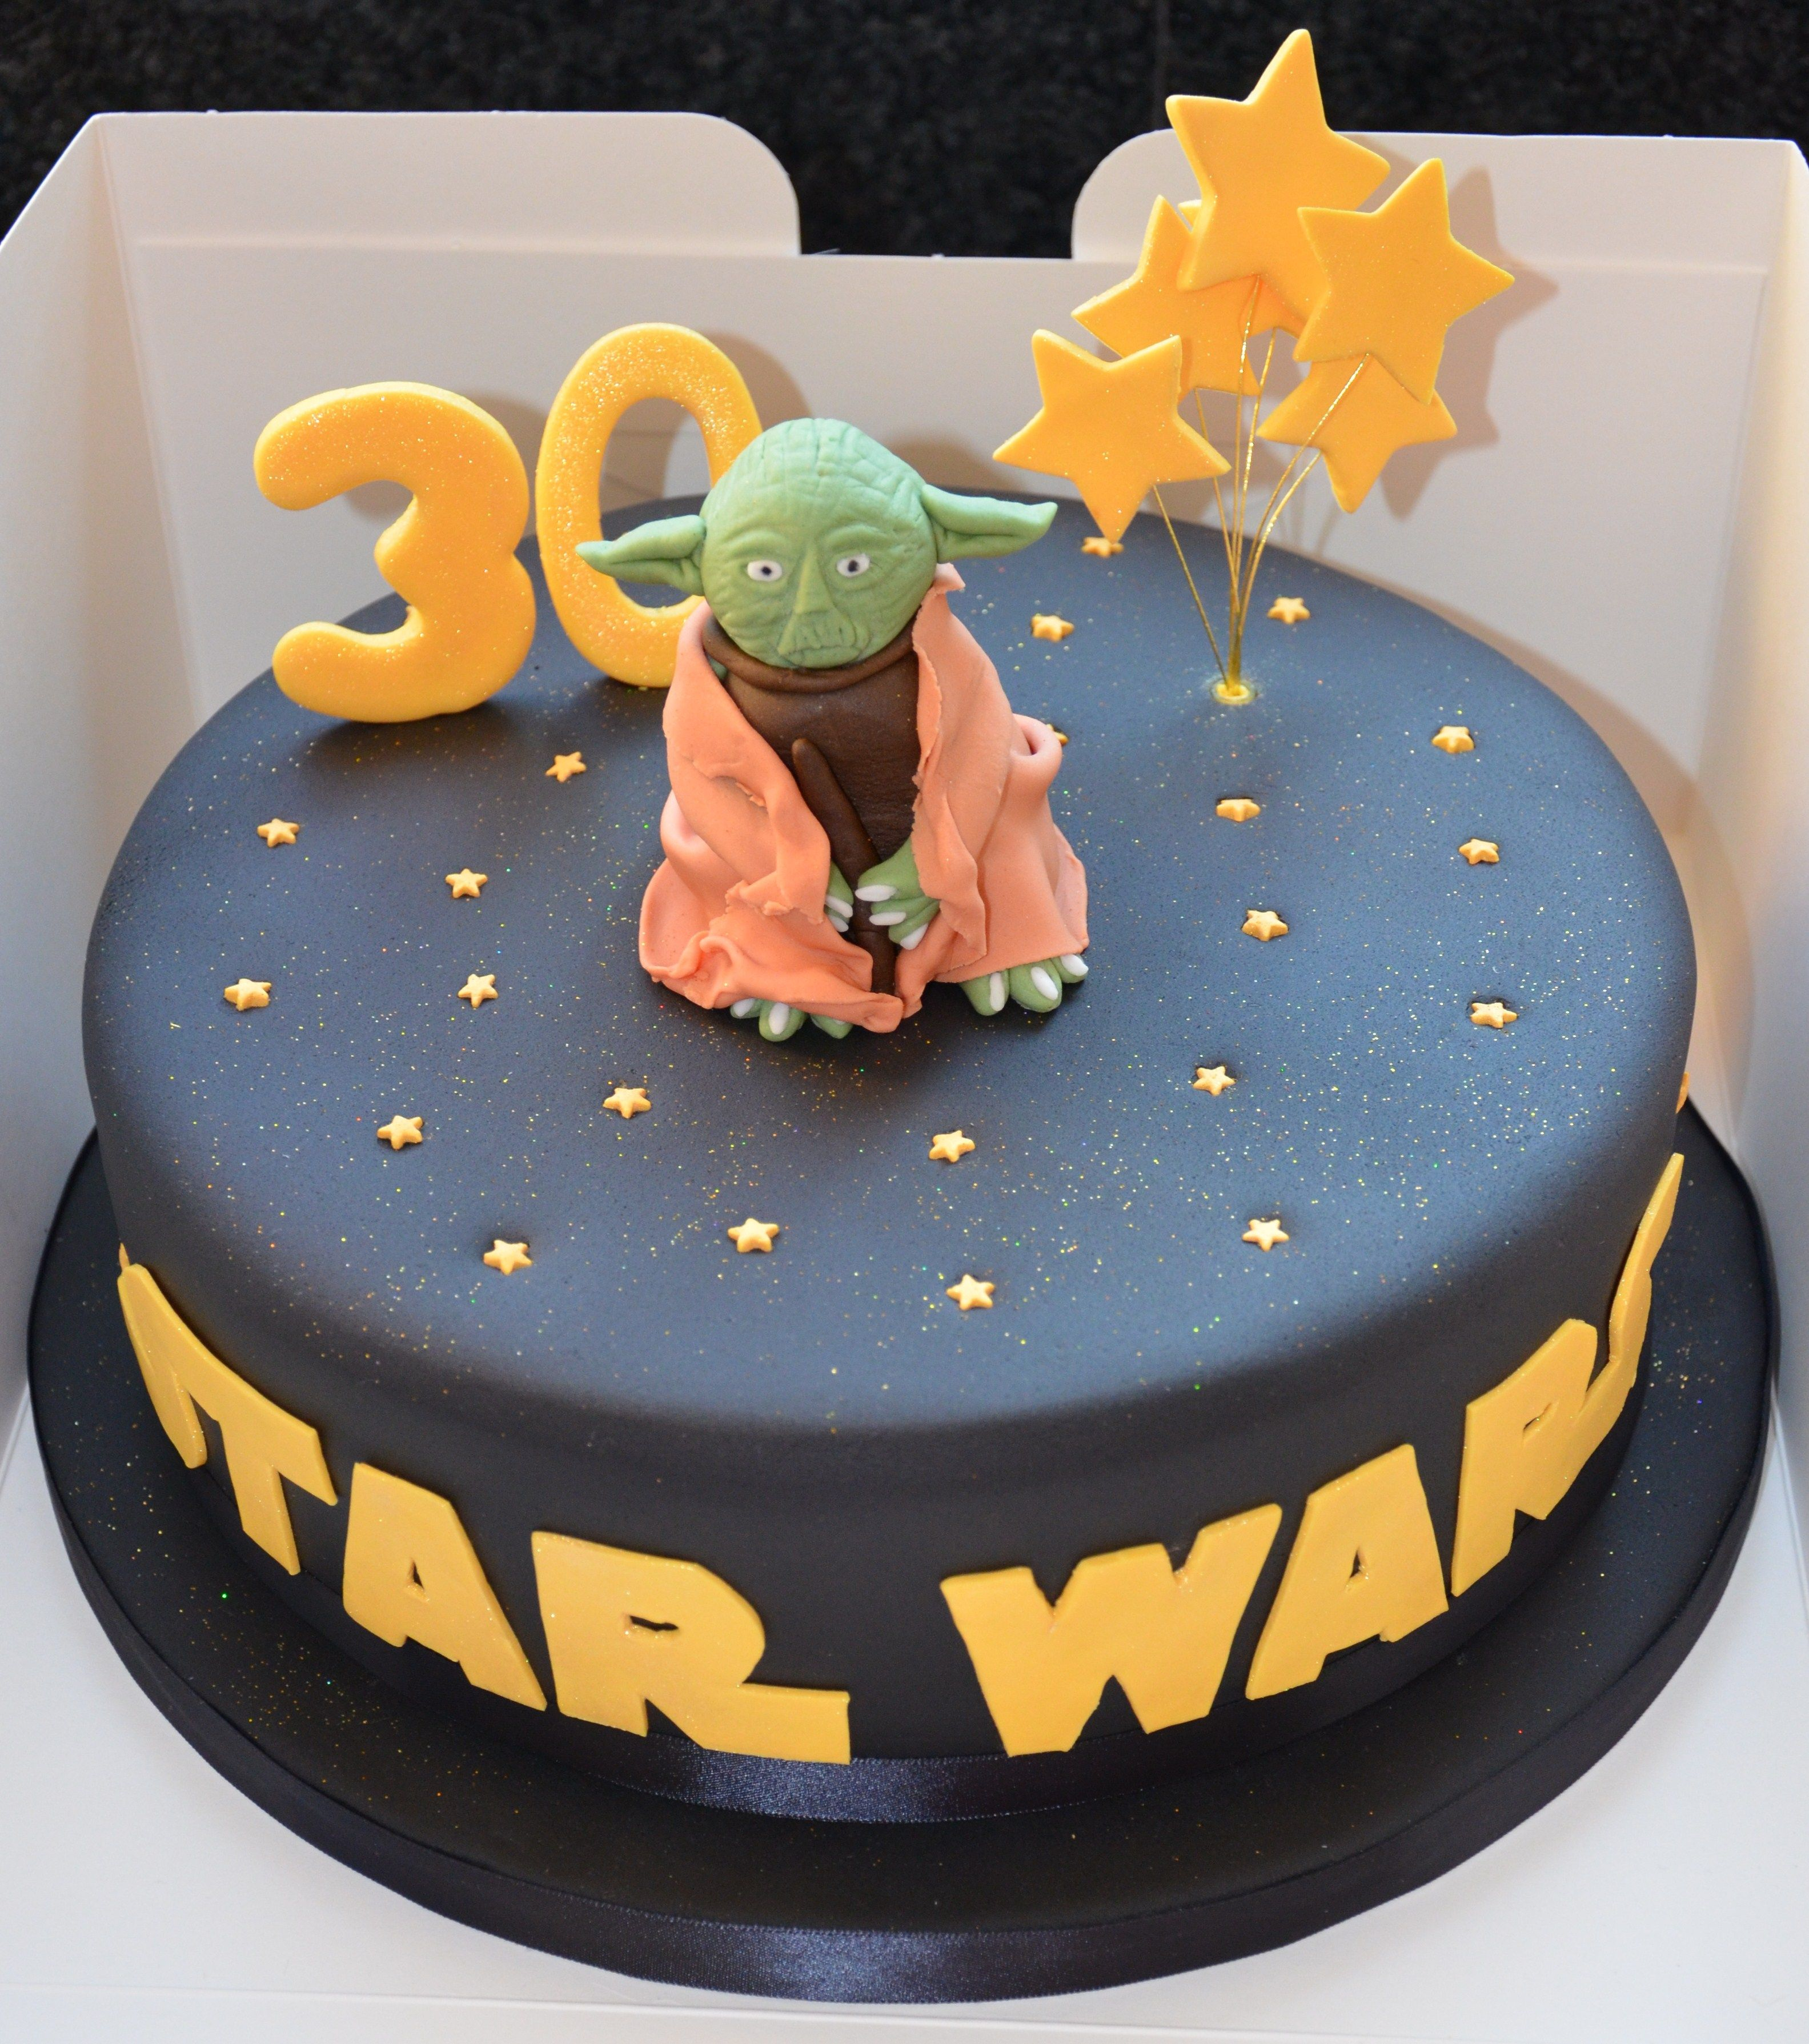 Star Wars Cake Decorations Inspiration Star Wars